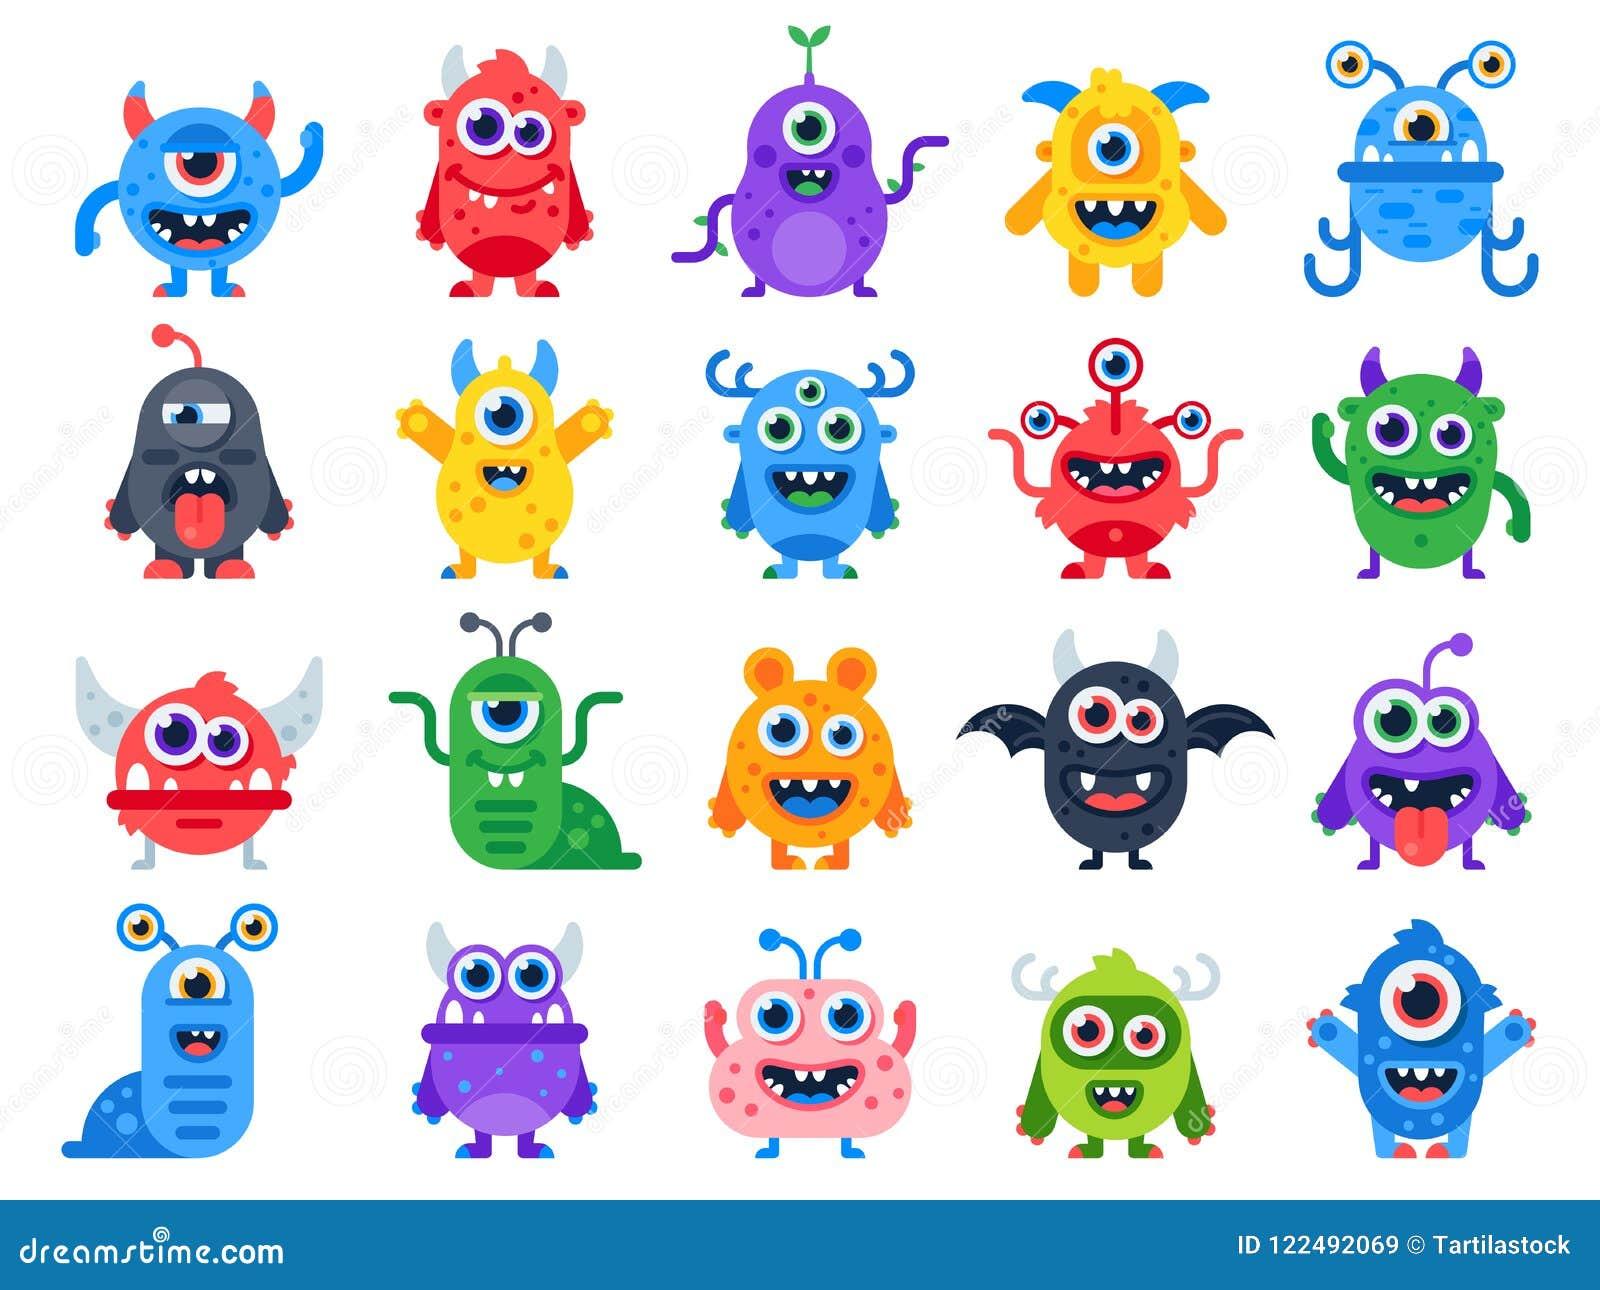 Monstro bonitos dos desenhos animados Caráteres alegres cômicos do monstro do Dia das Bruxas Diabo engraçado, estrangeiro feio e